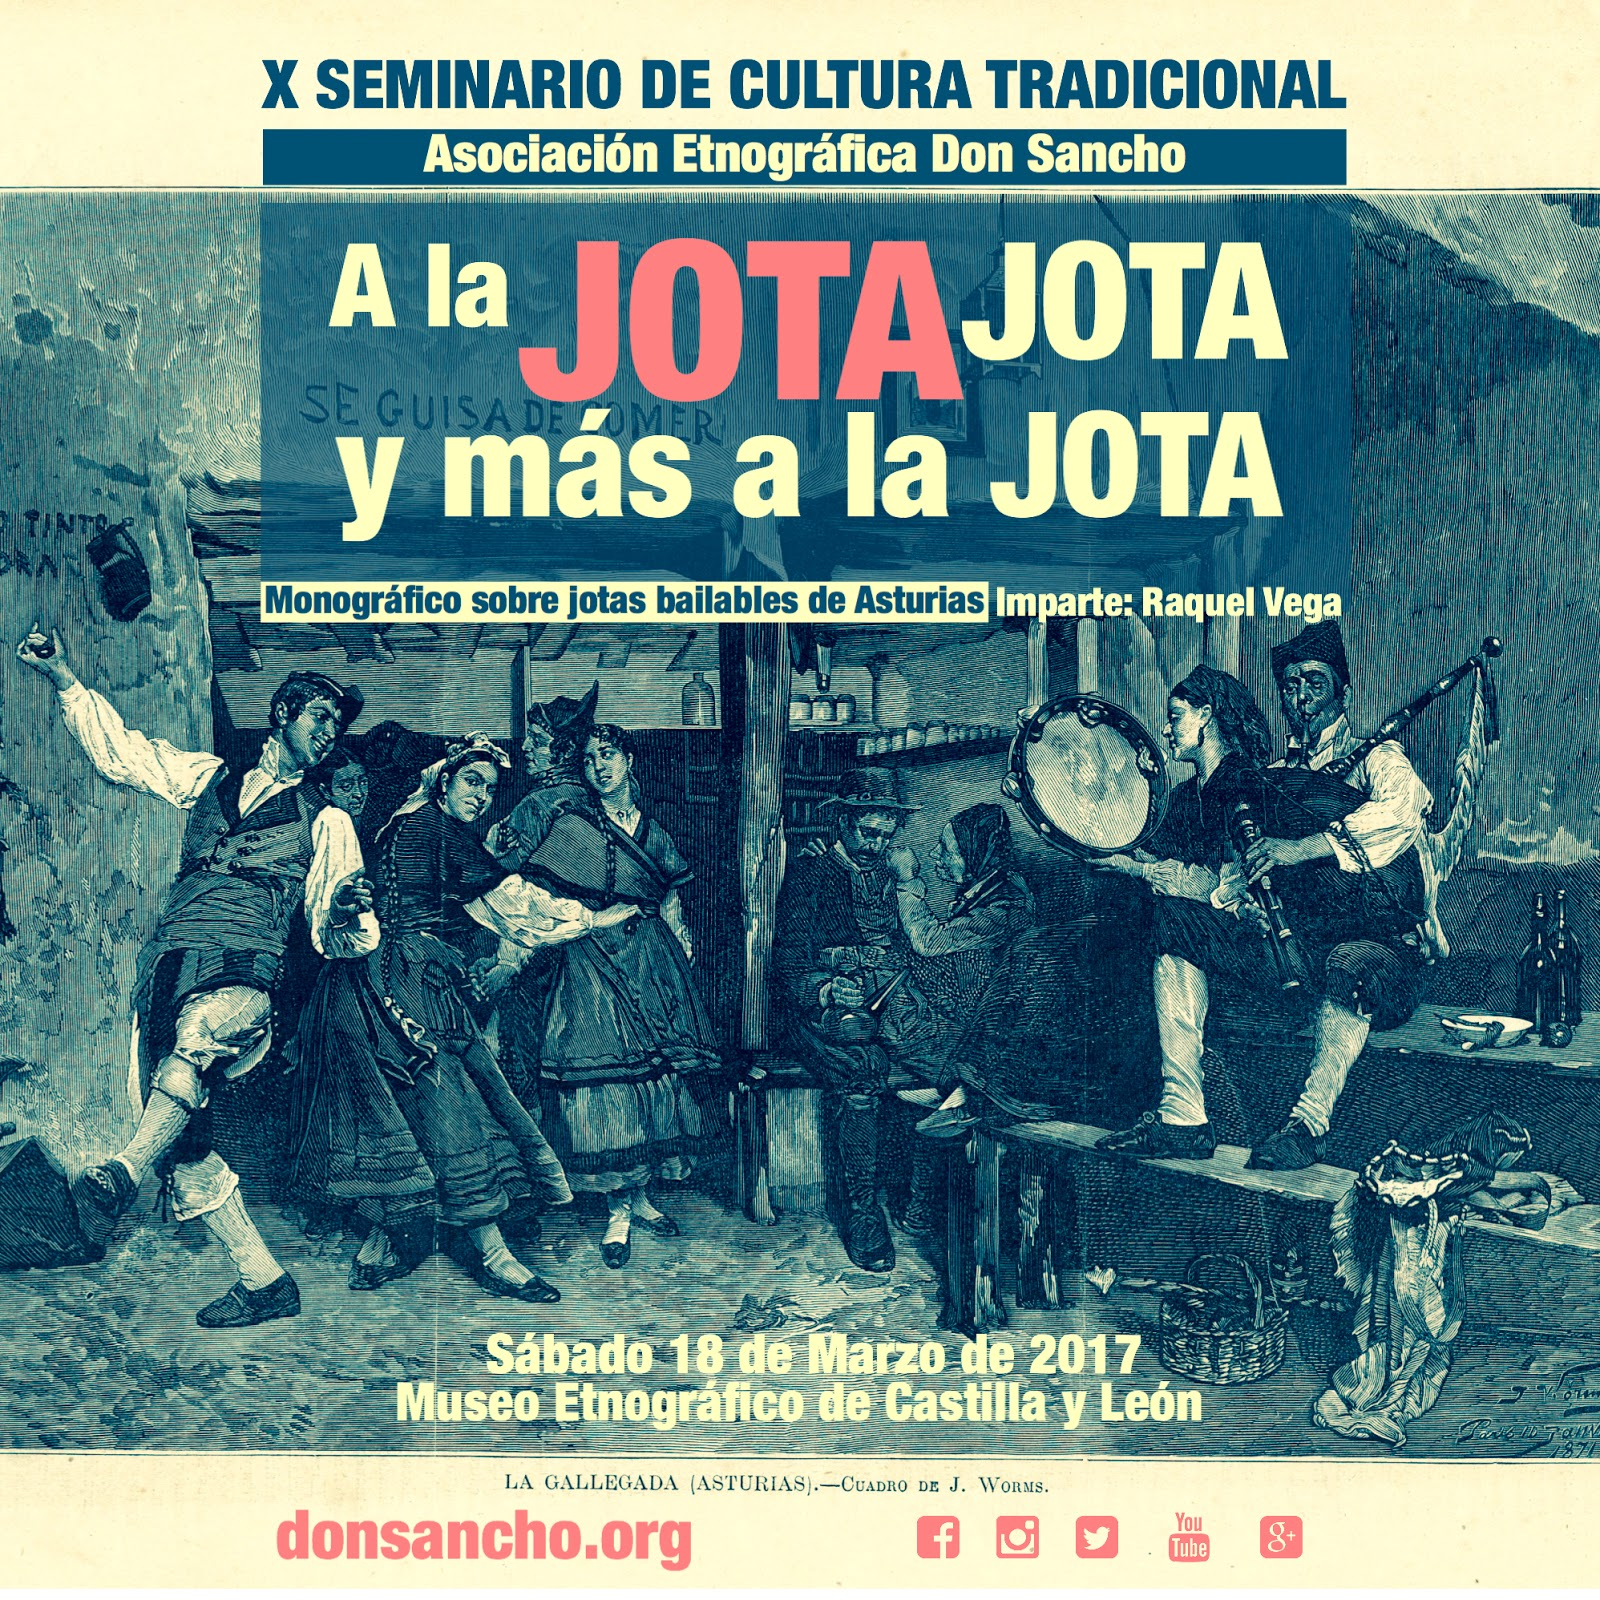 DON SANCHO. Difusión de la Cultura Tradicional de Zamora ... - photo#49